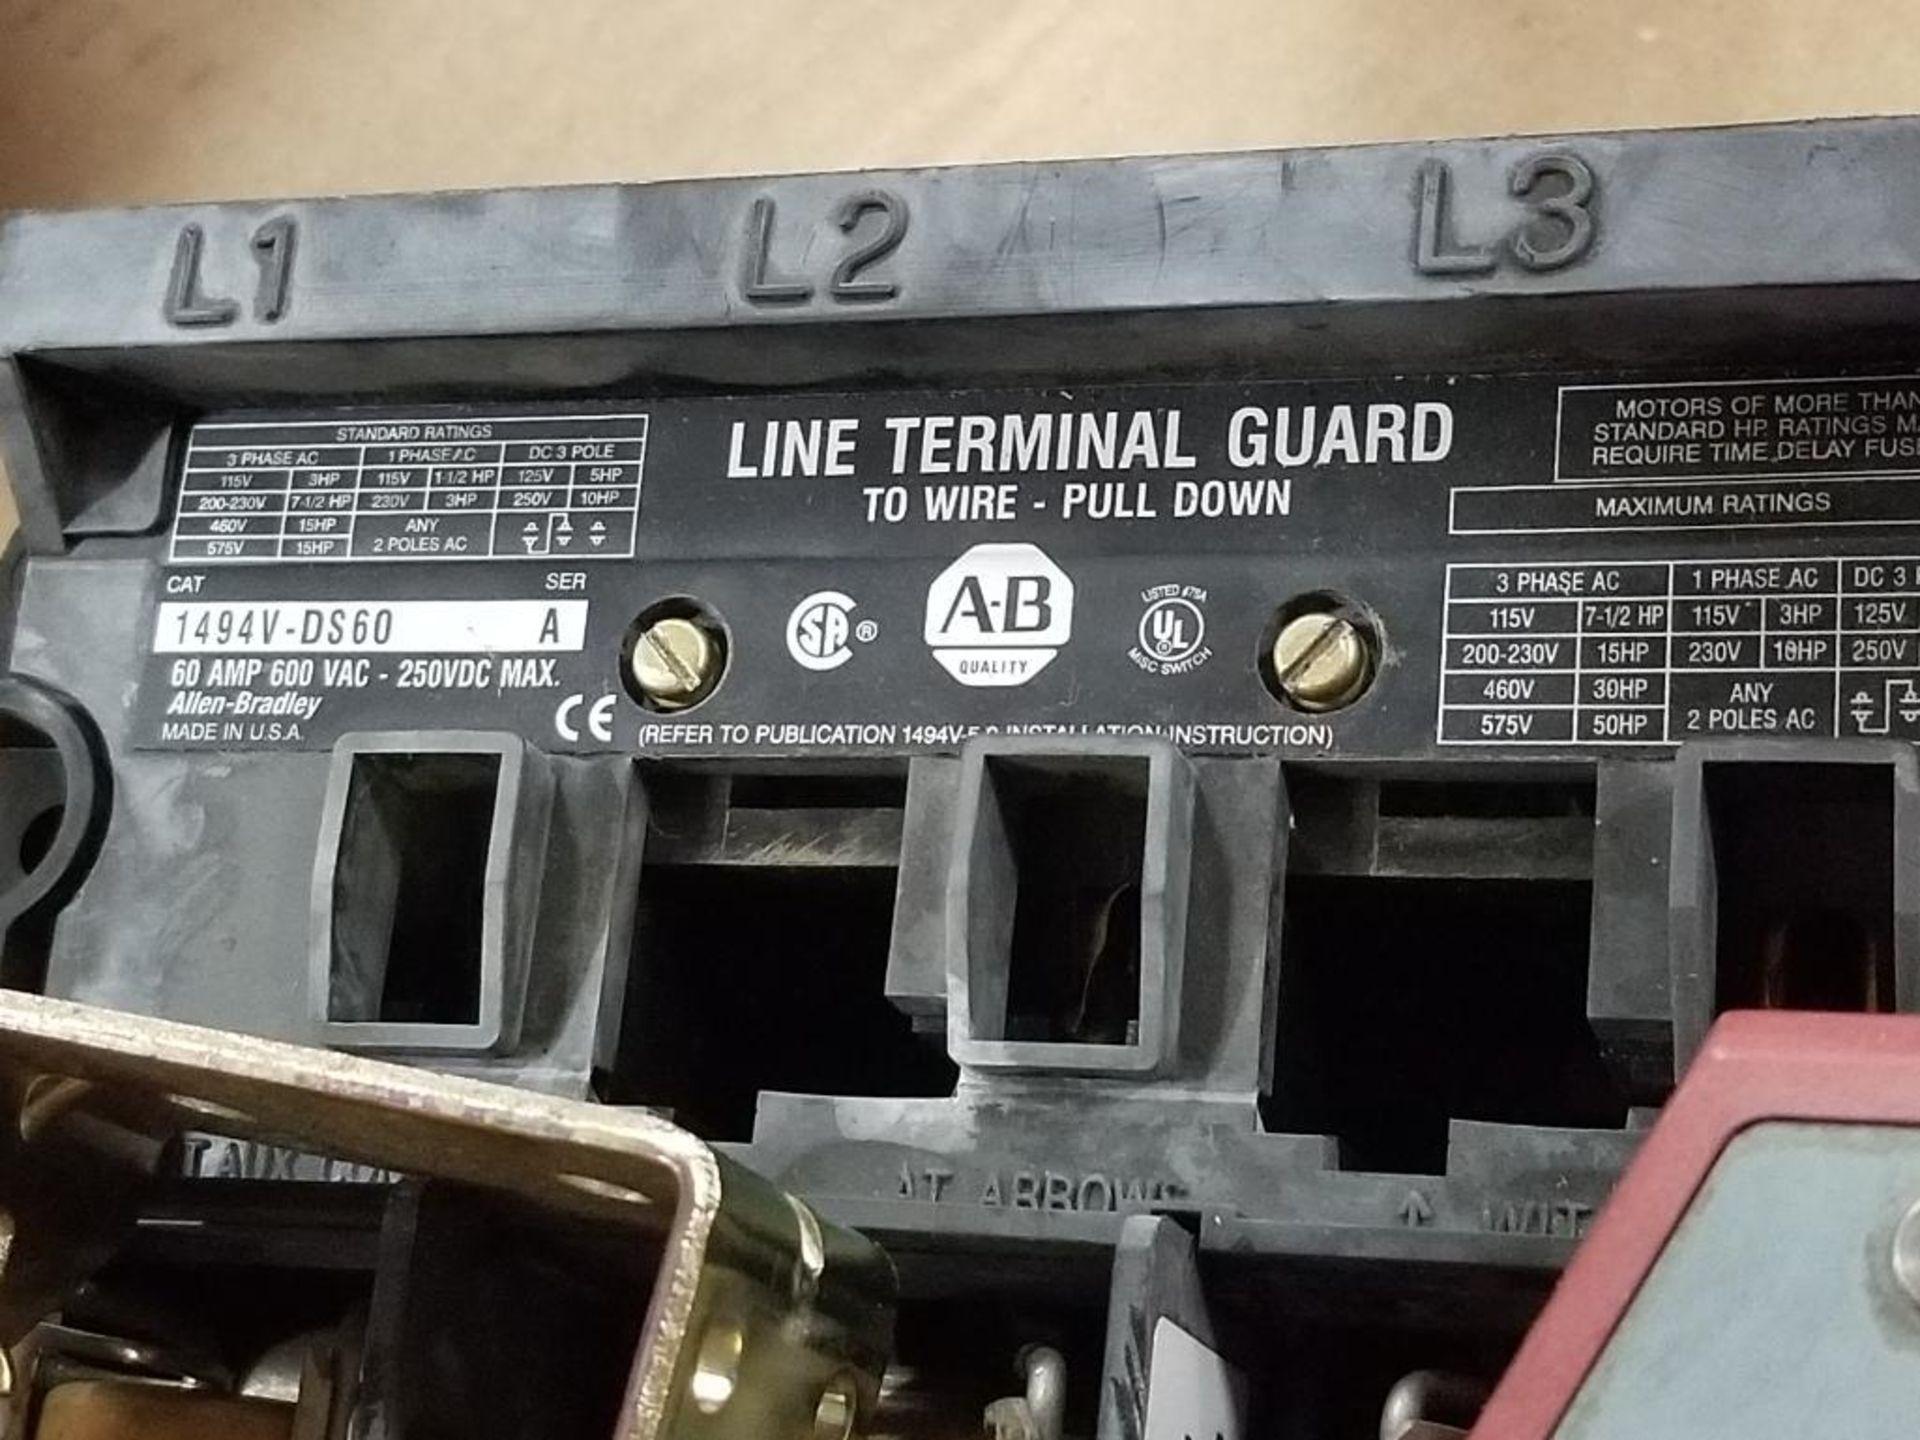 Allen Bradley 1494V-FS60 Disconnect switch. - Image 2 of 5